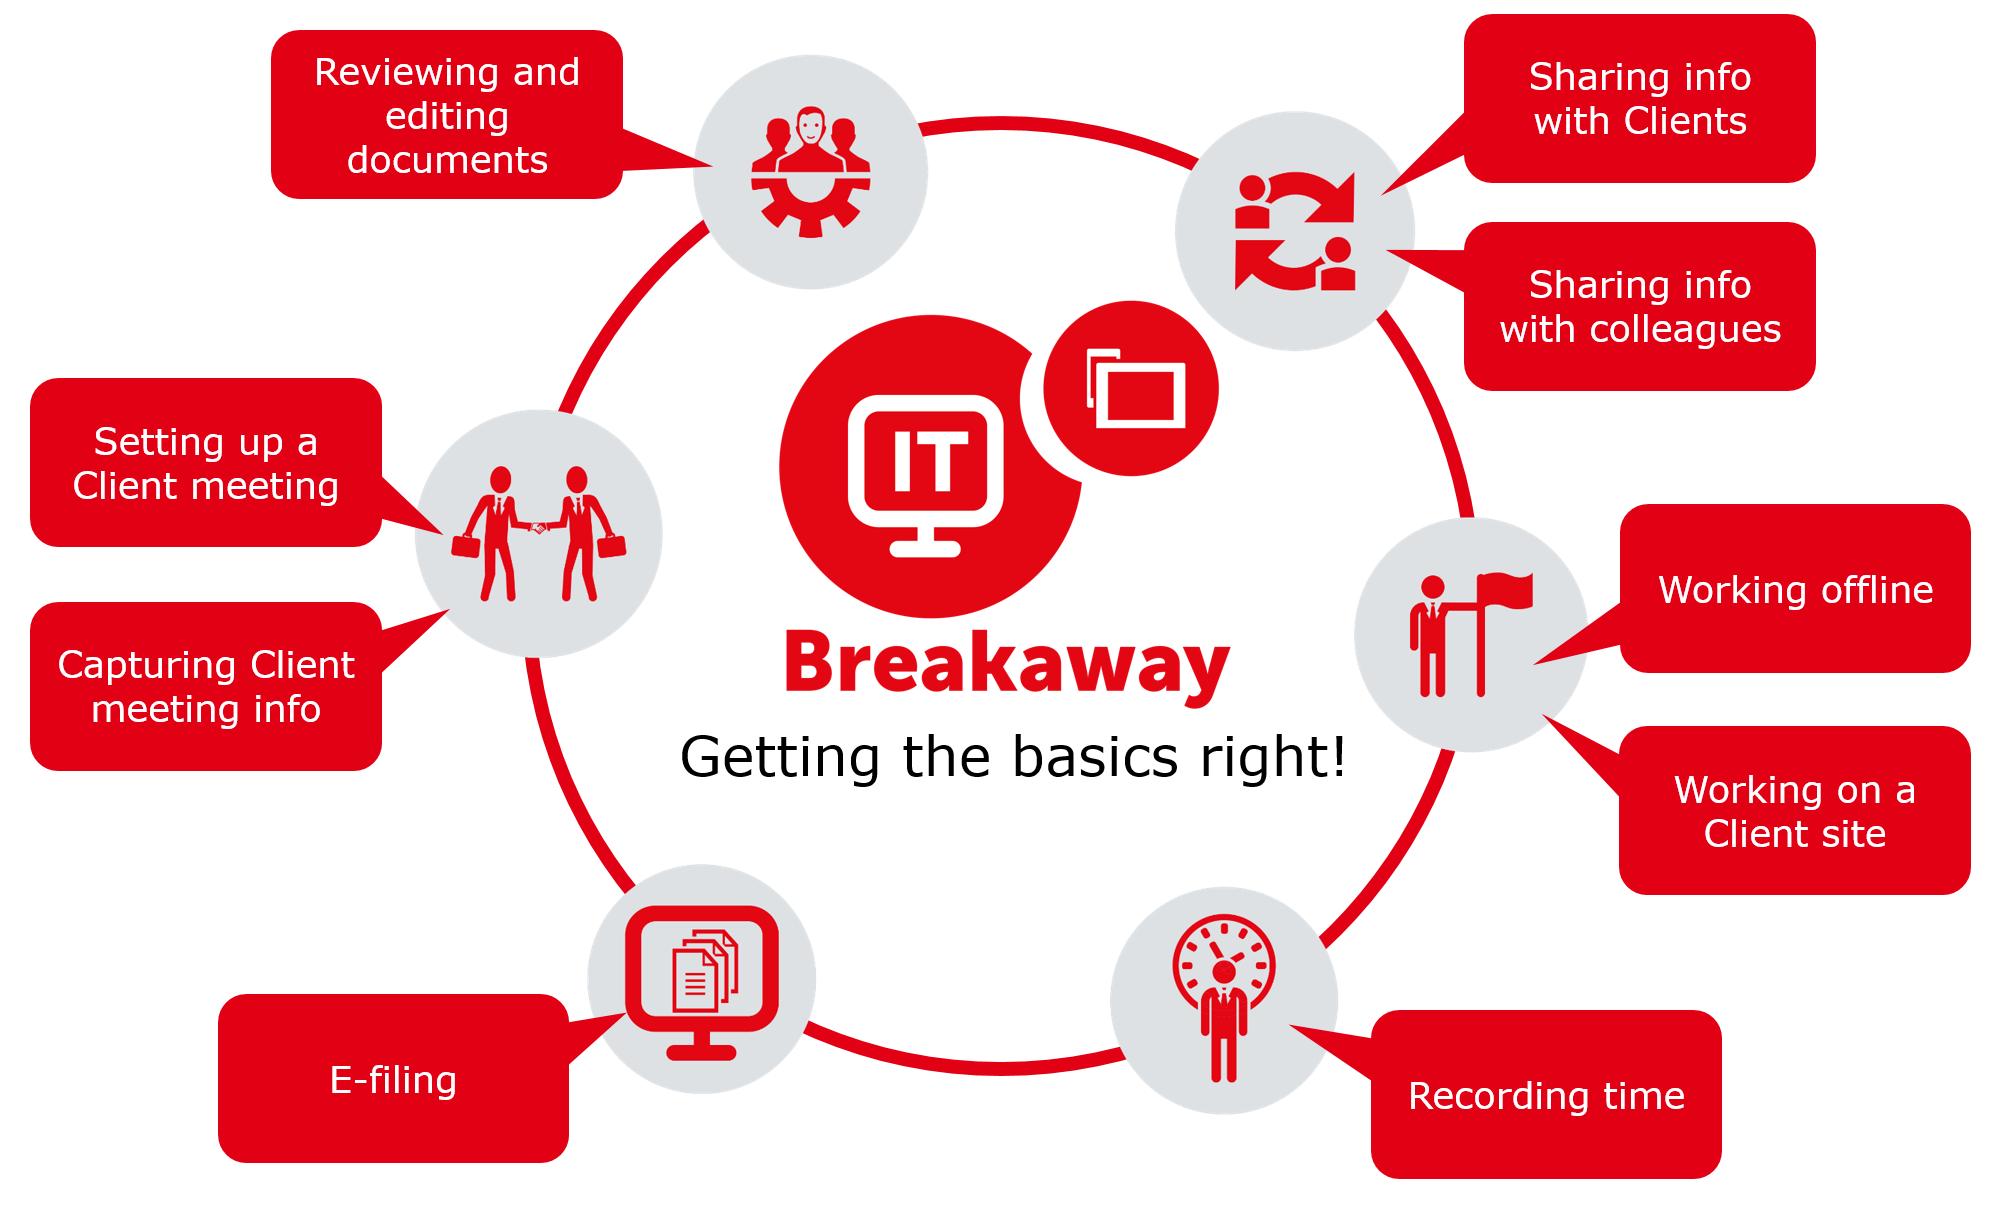 Breakaway basic diag